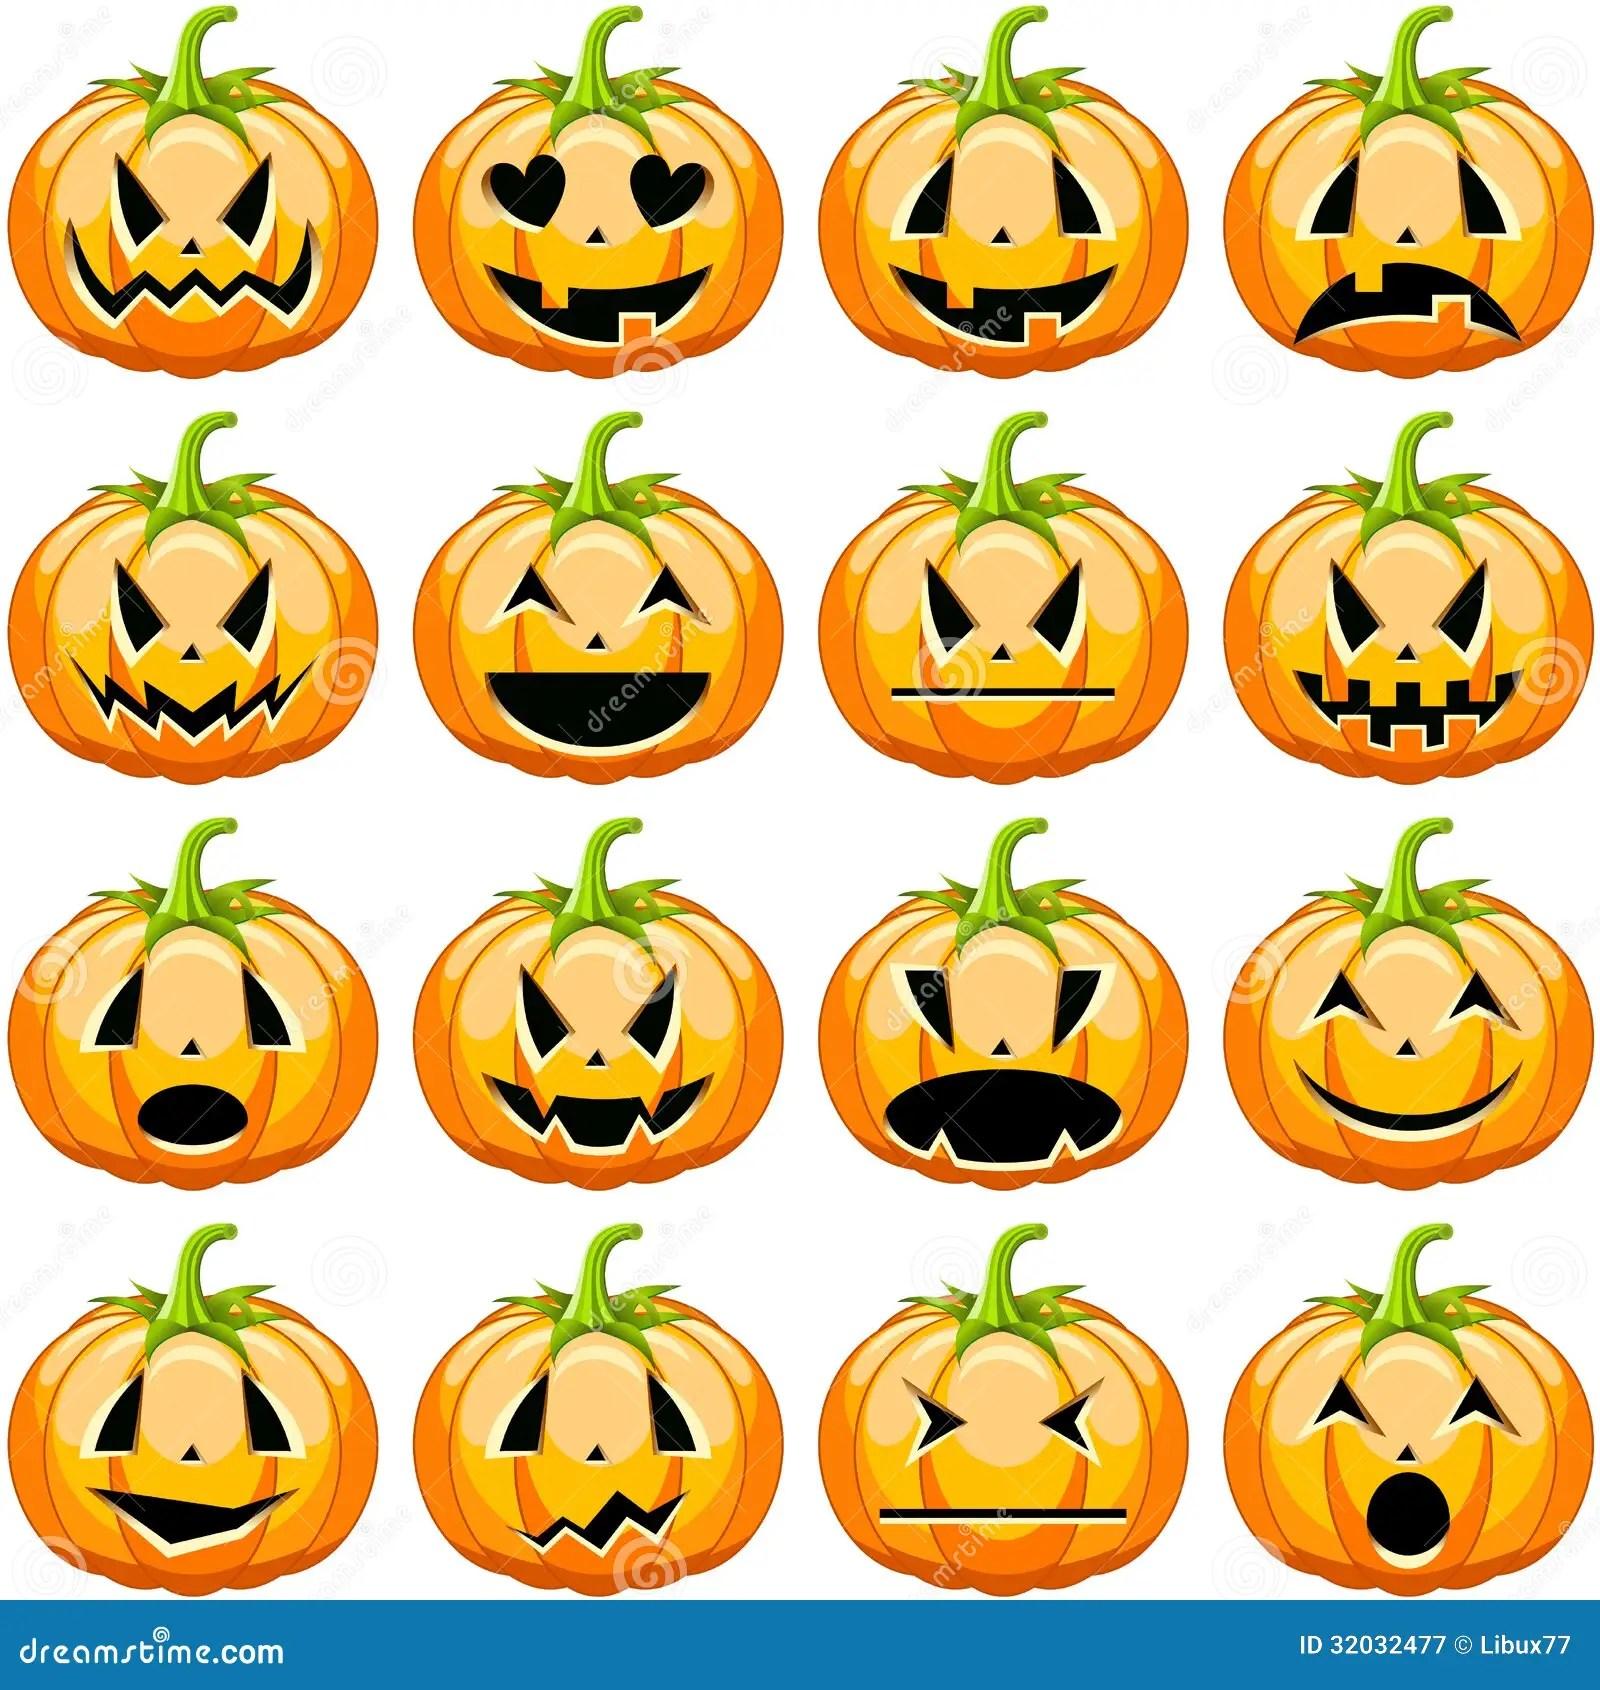 Halloween Pumpkins Set Royalty Free Stock Photography